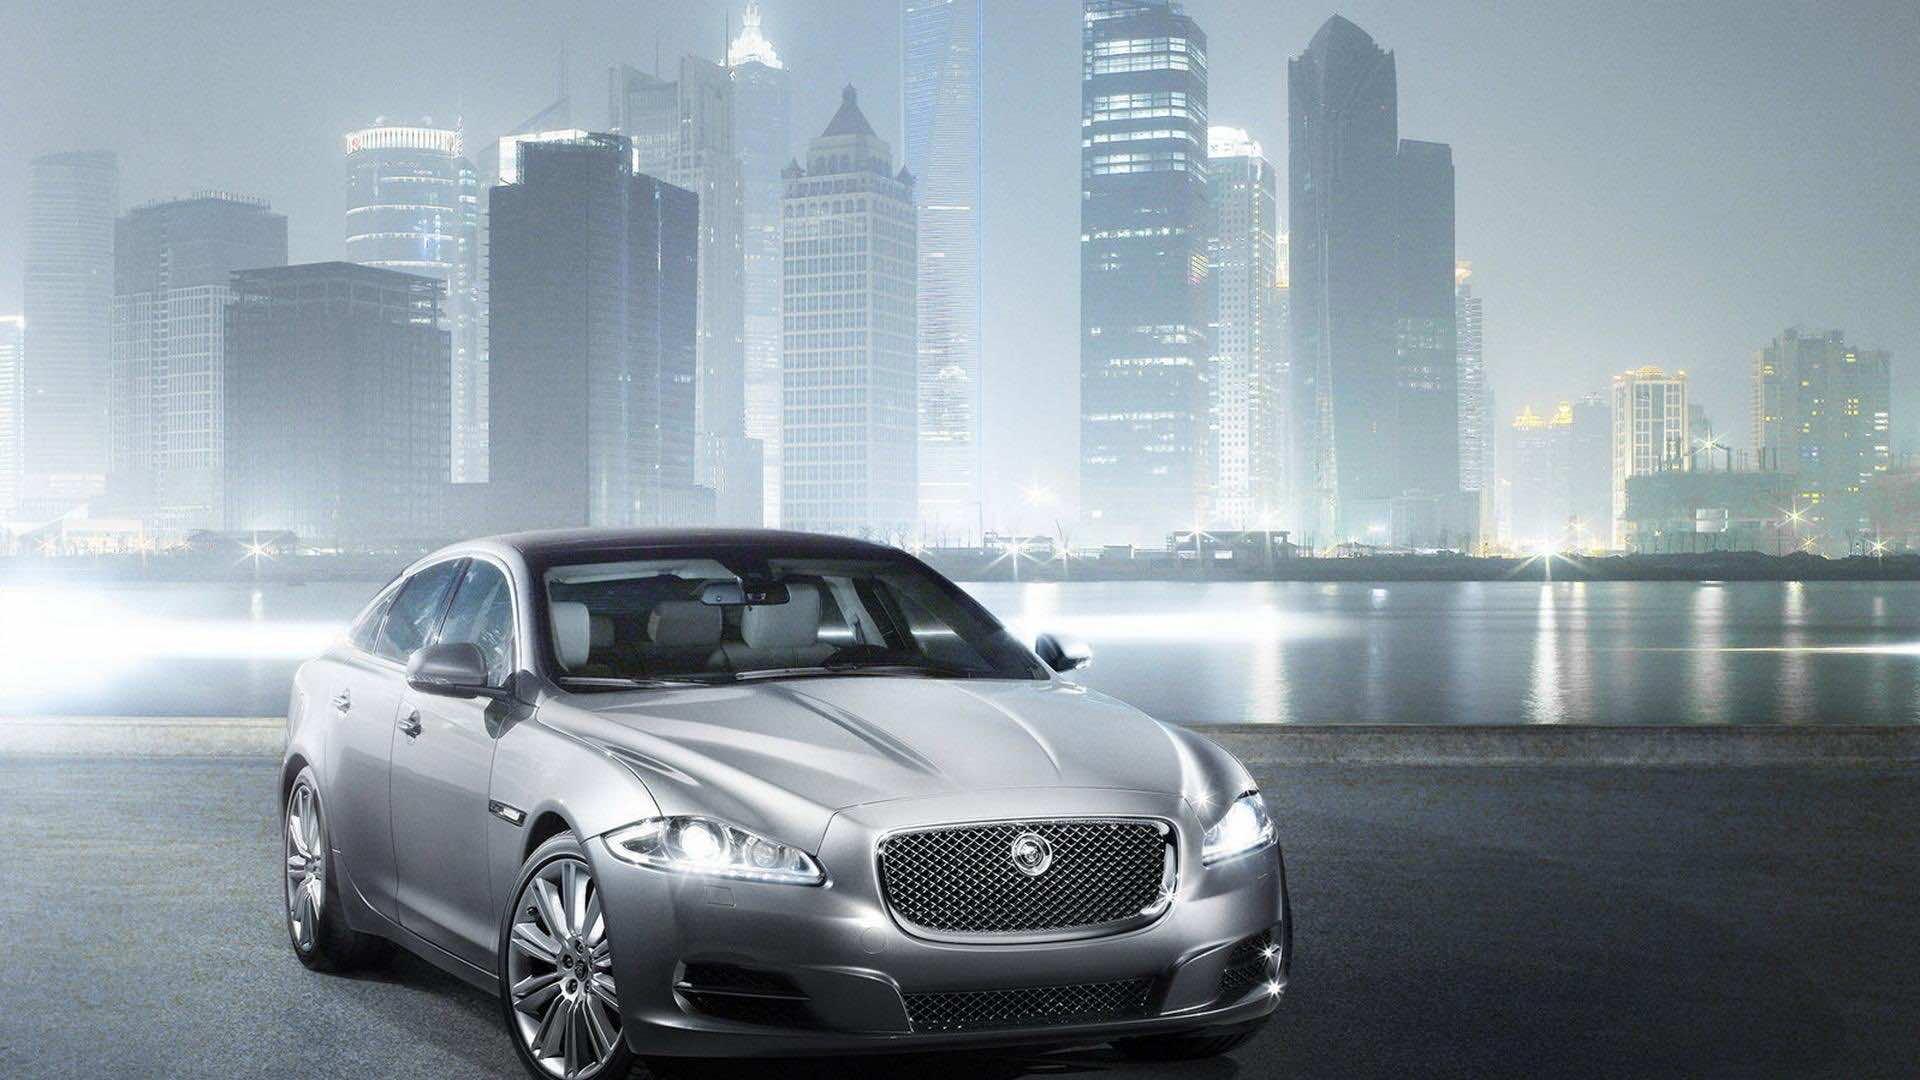 Cars Wallpapers: 35+ Free Jaguar Wallpaper Images For Desktop Download